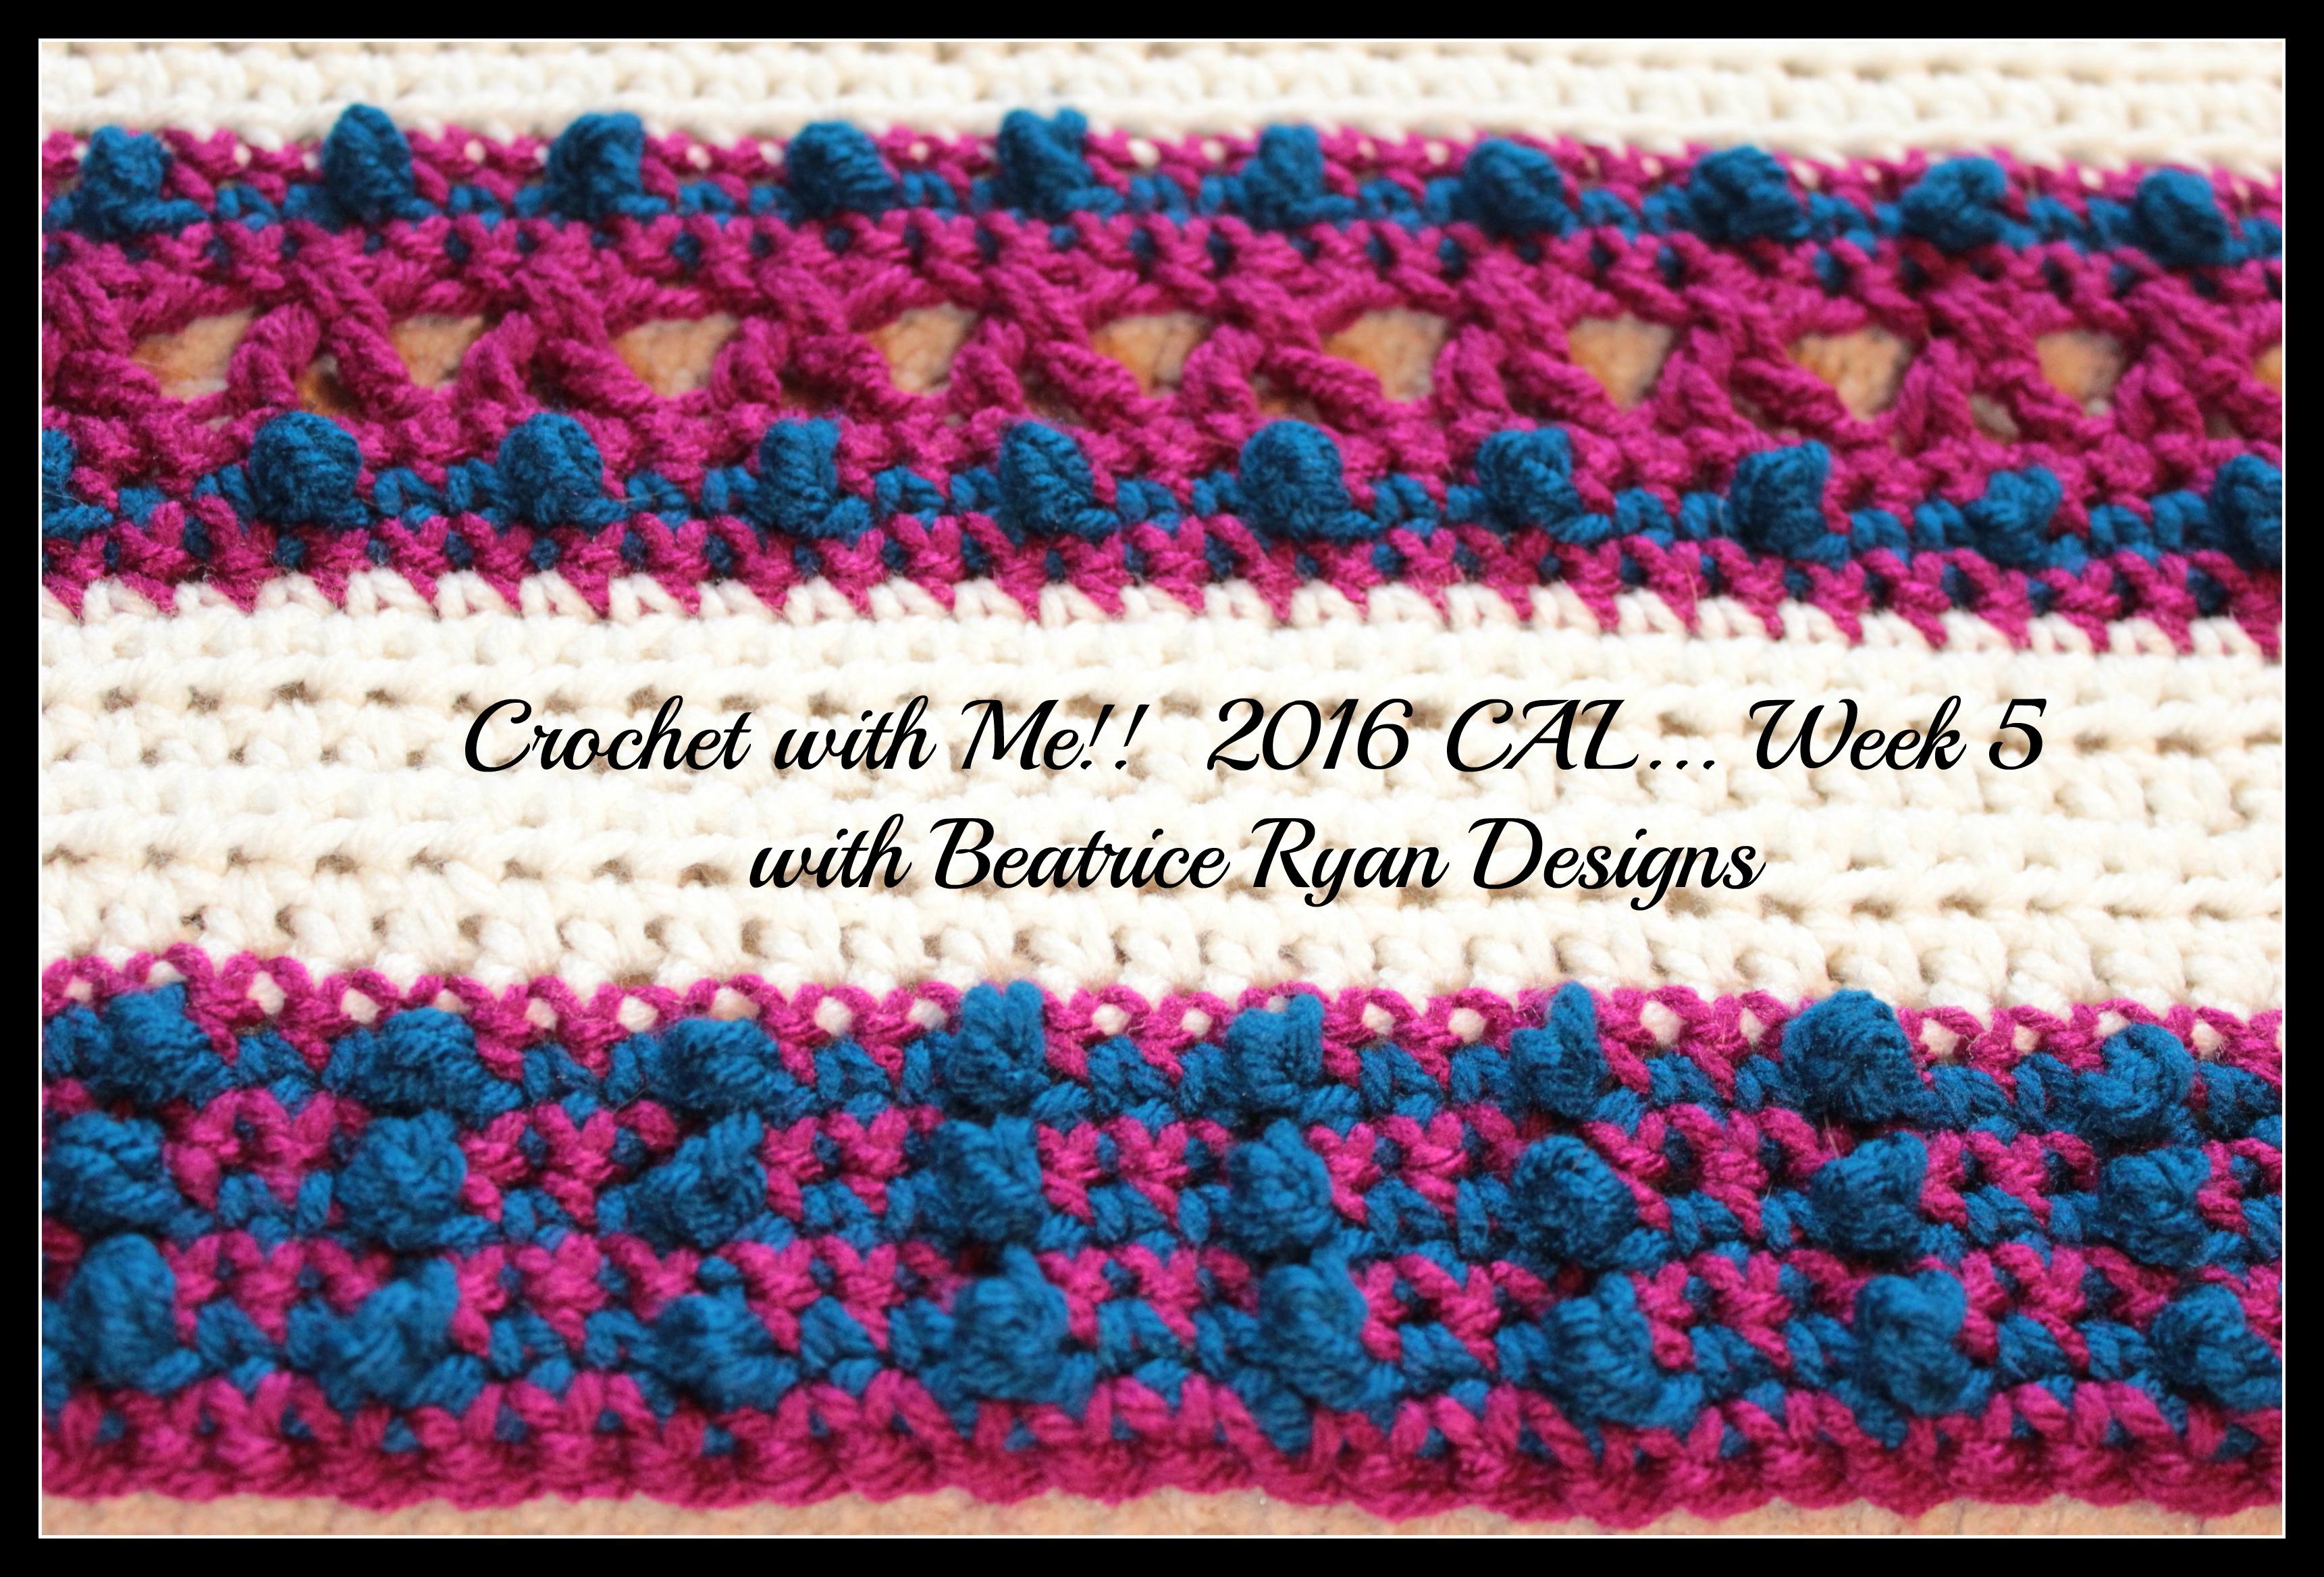 week 5 upclose 2016 CAL